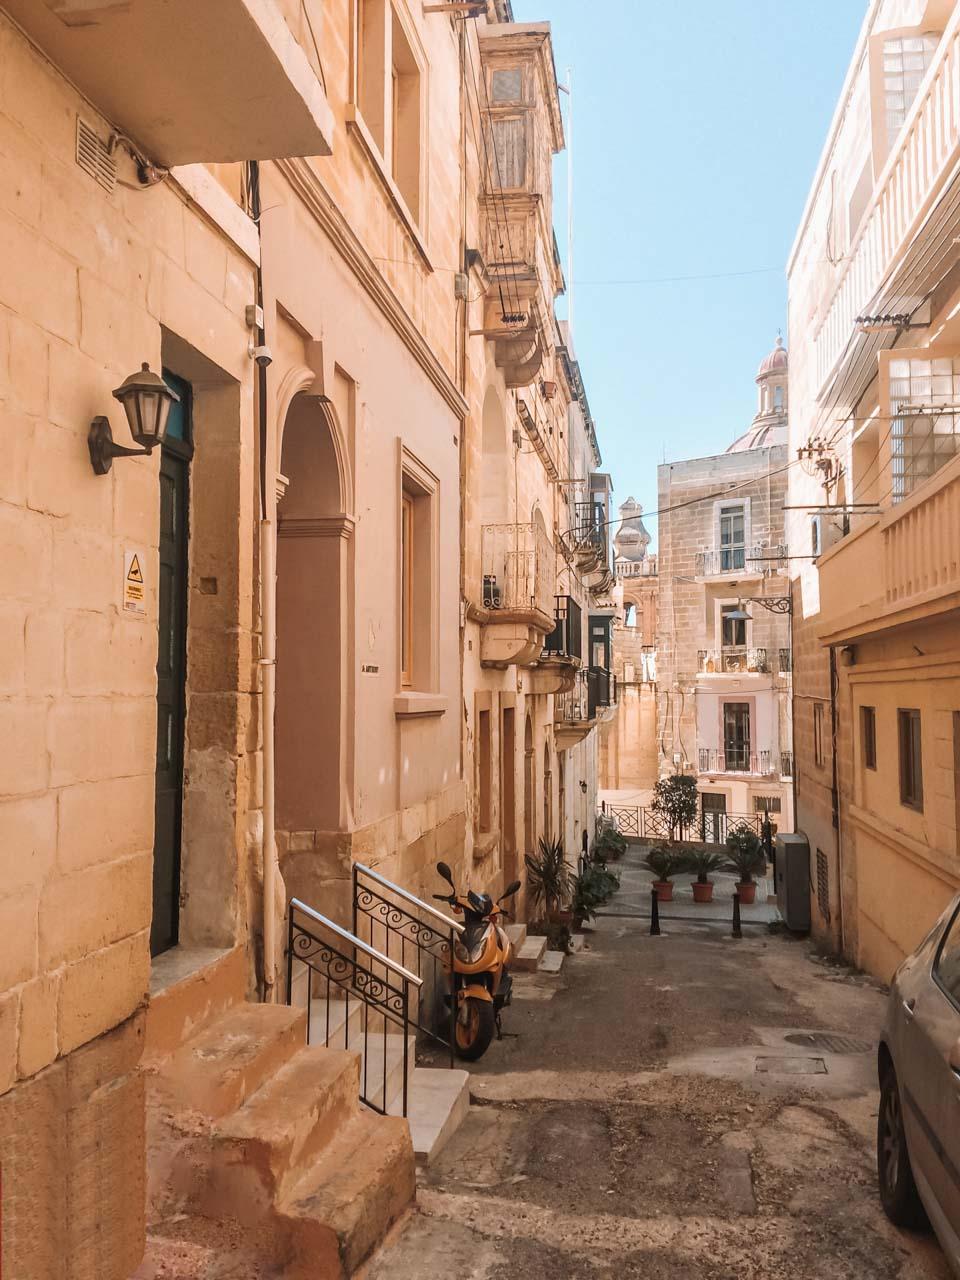 A traditional street in Birgu, Malta